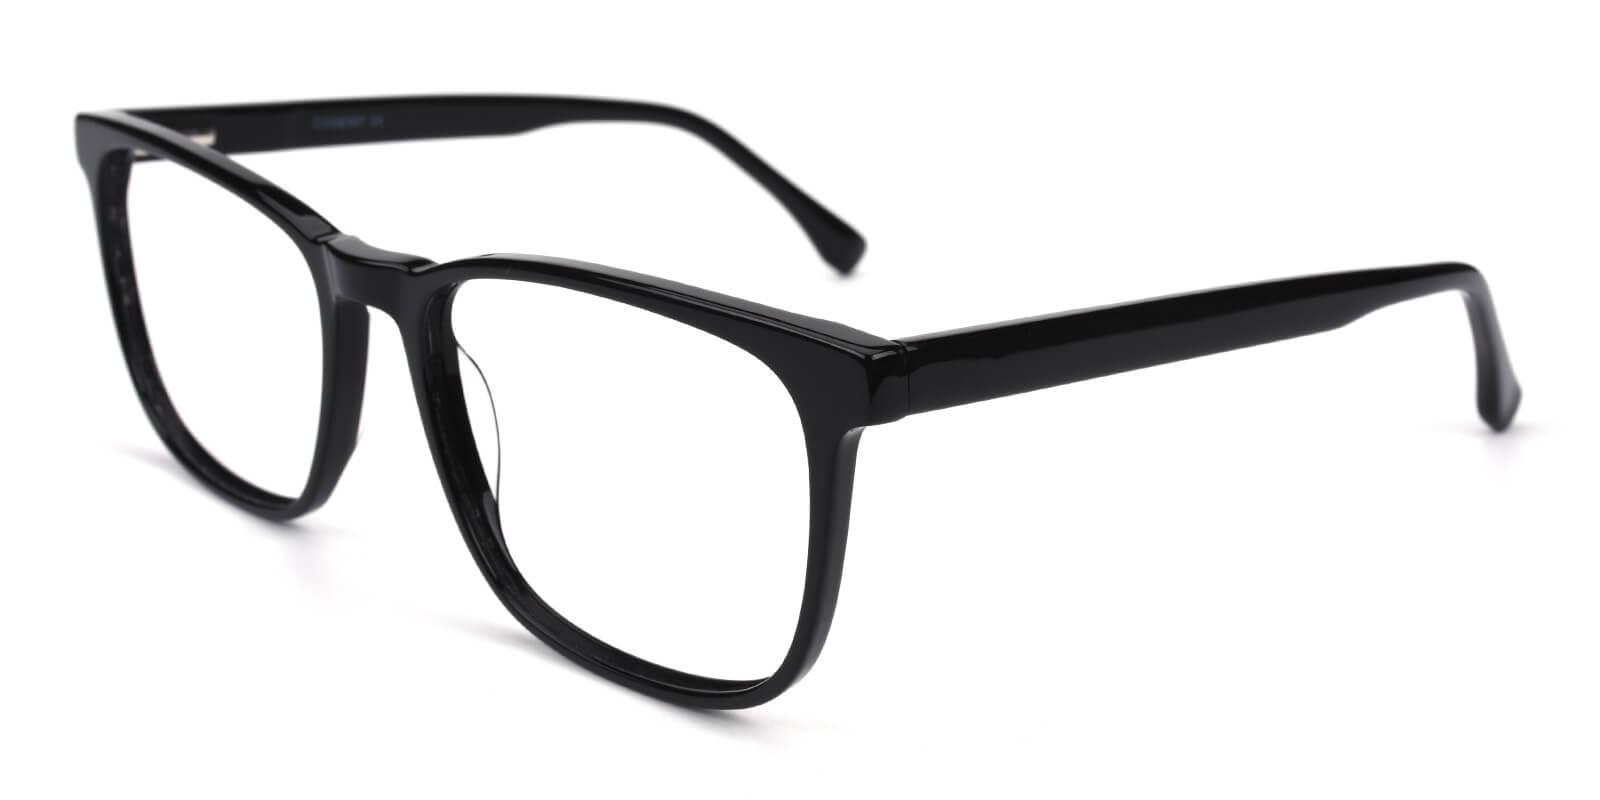 Tages-Black-Square-Acetate-Eyeglasses-additional1